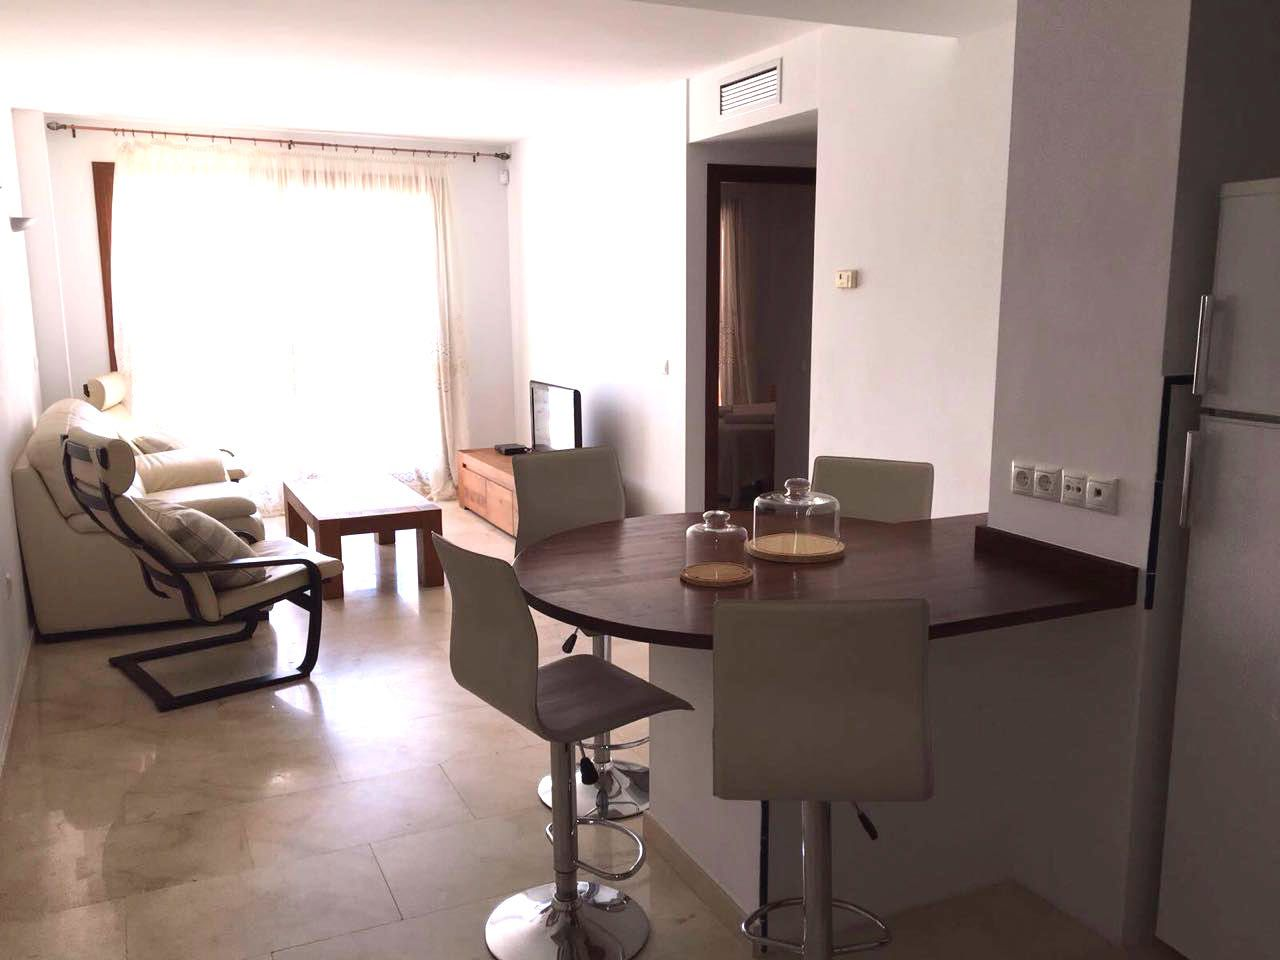 Апартаменты в Ориуэла Коста, Испания, 70 м2 - фото 2